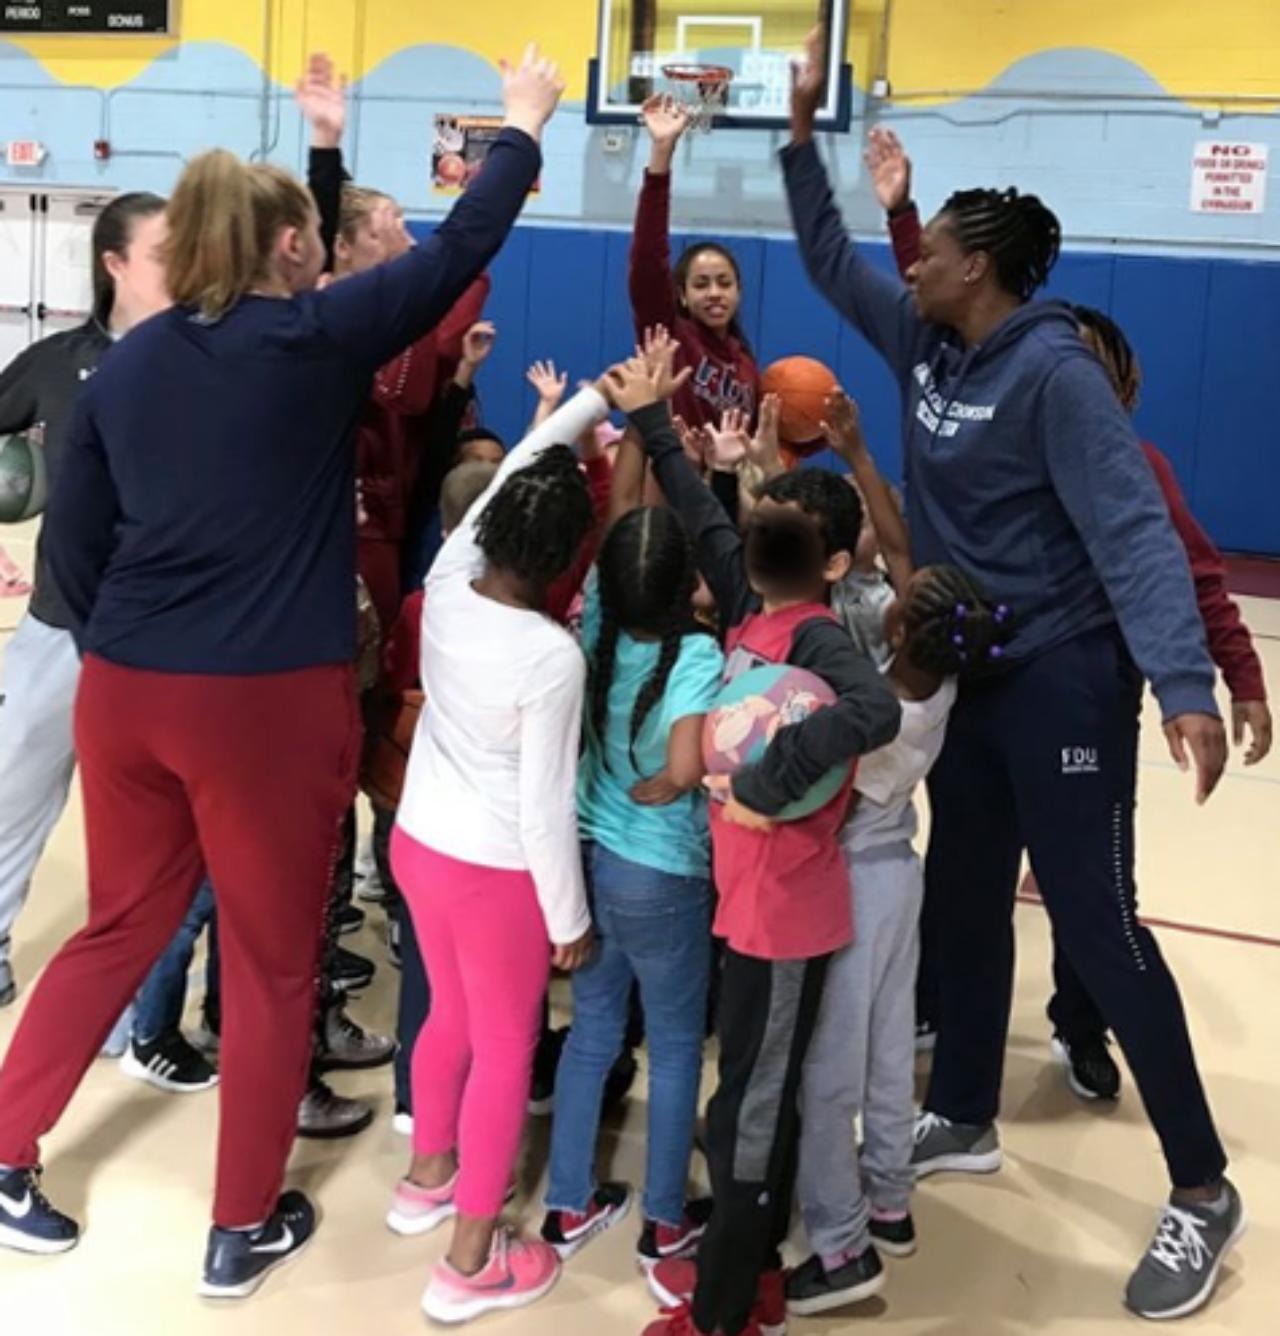 Knights women's basketball members high five children